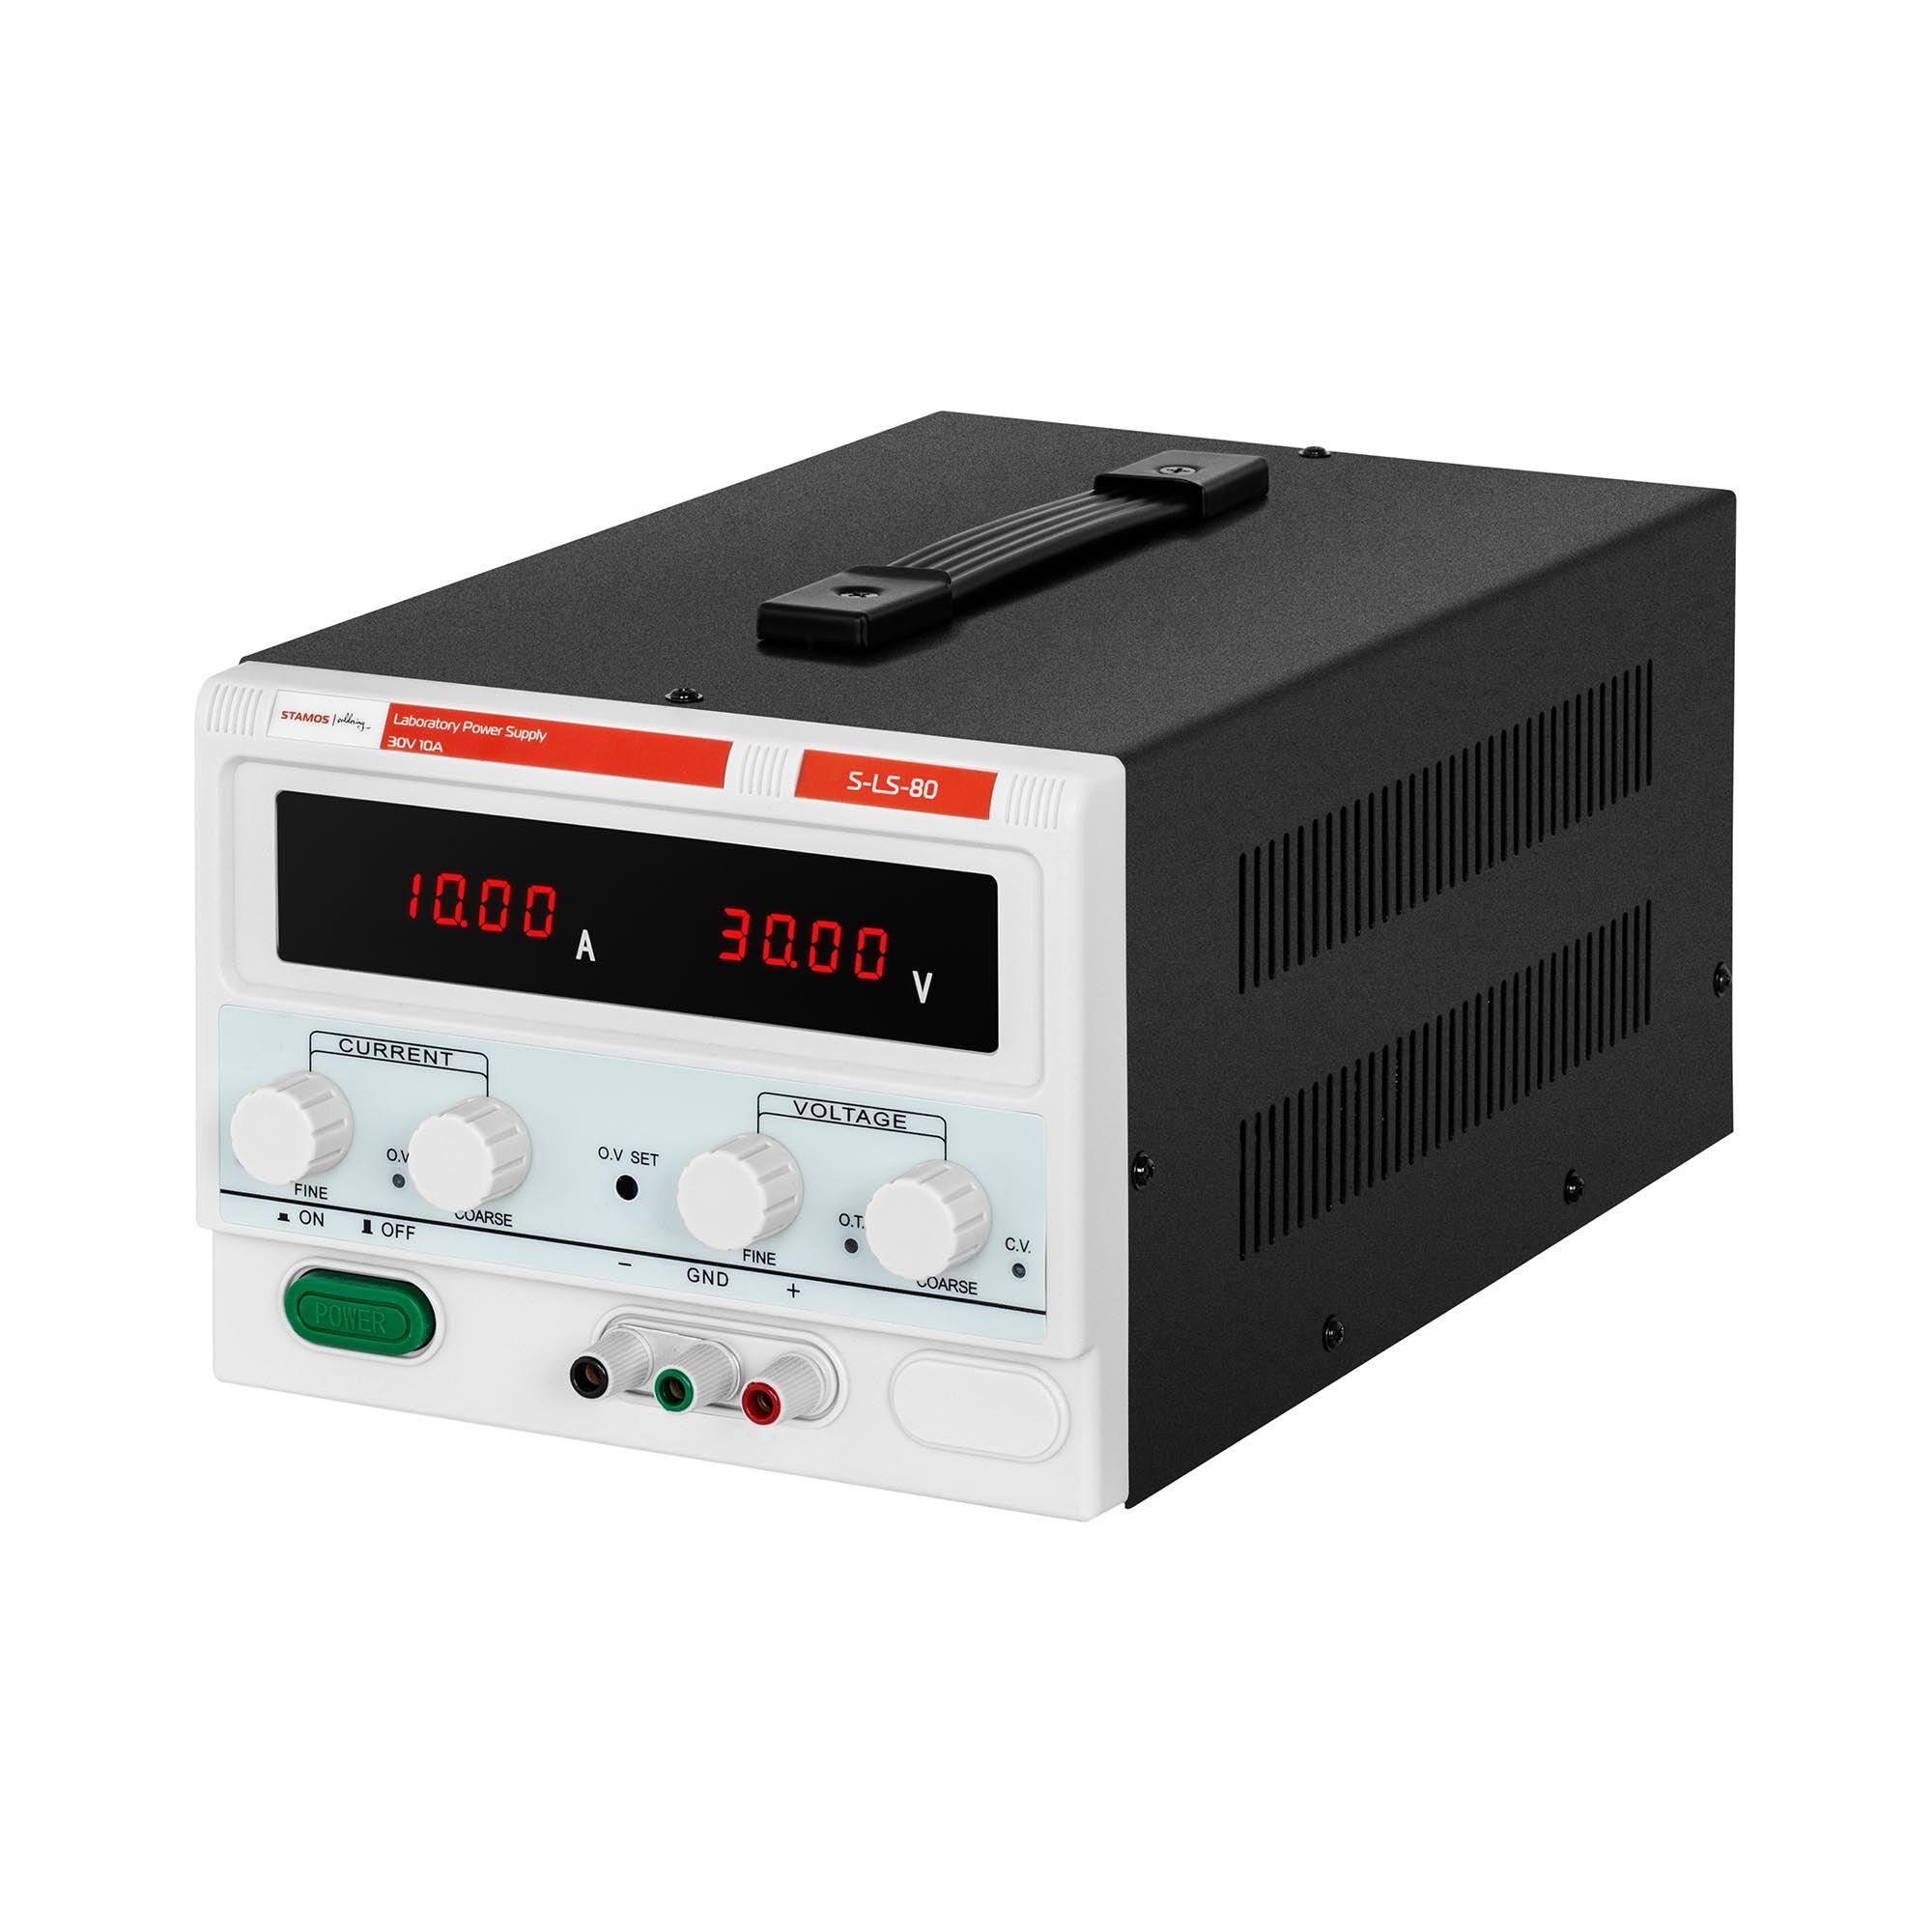 Stamos Soldering Laboratory Power Supply - 0-30 V - 0-10 A DC - 300 W